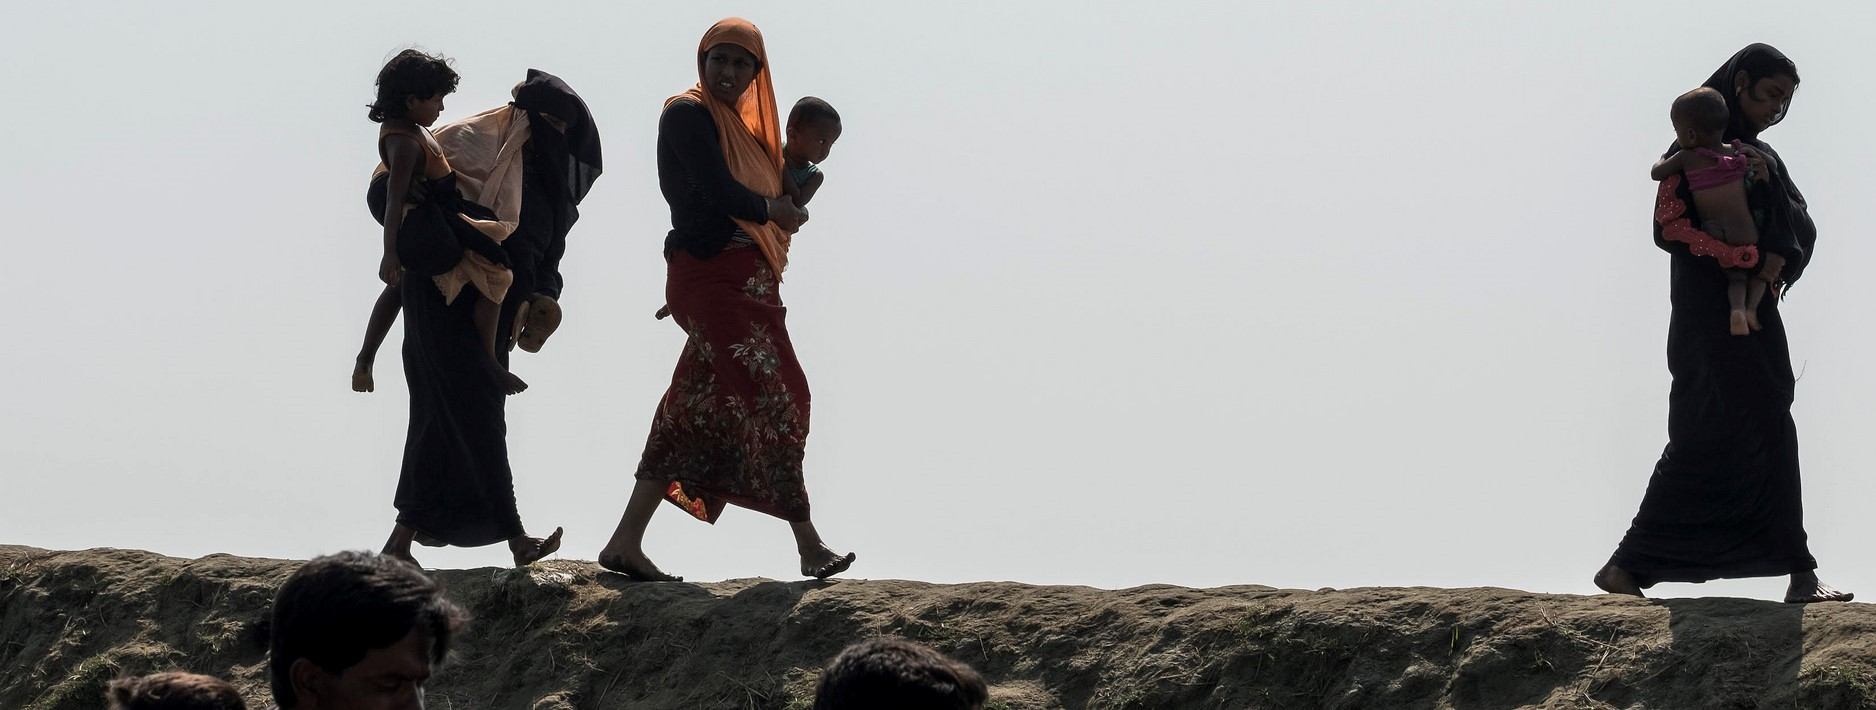 Rohingya refugees in Bangladesh, December 2017 (Photo: Catholic Diocese of Saginaw/Flickr)